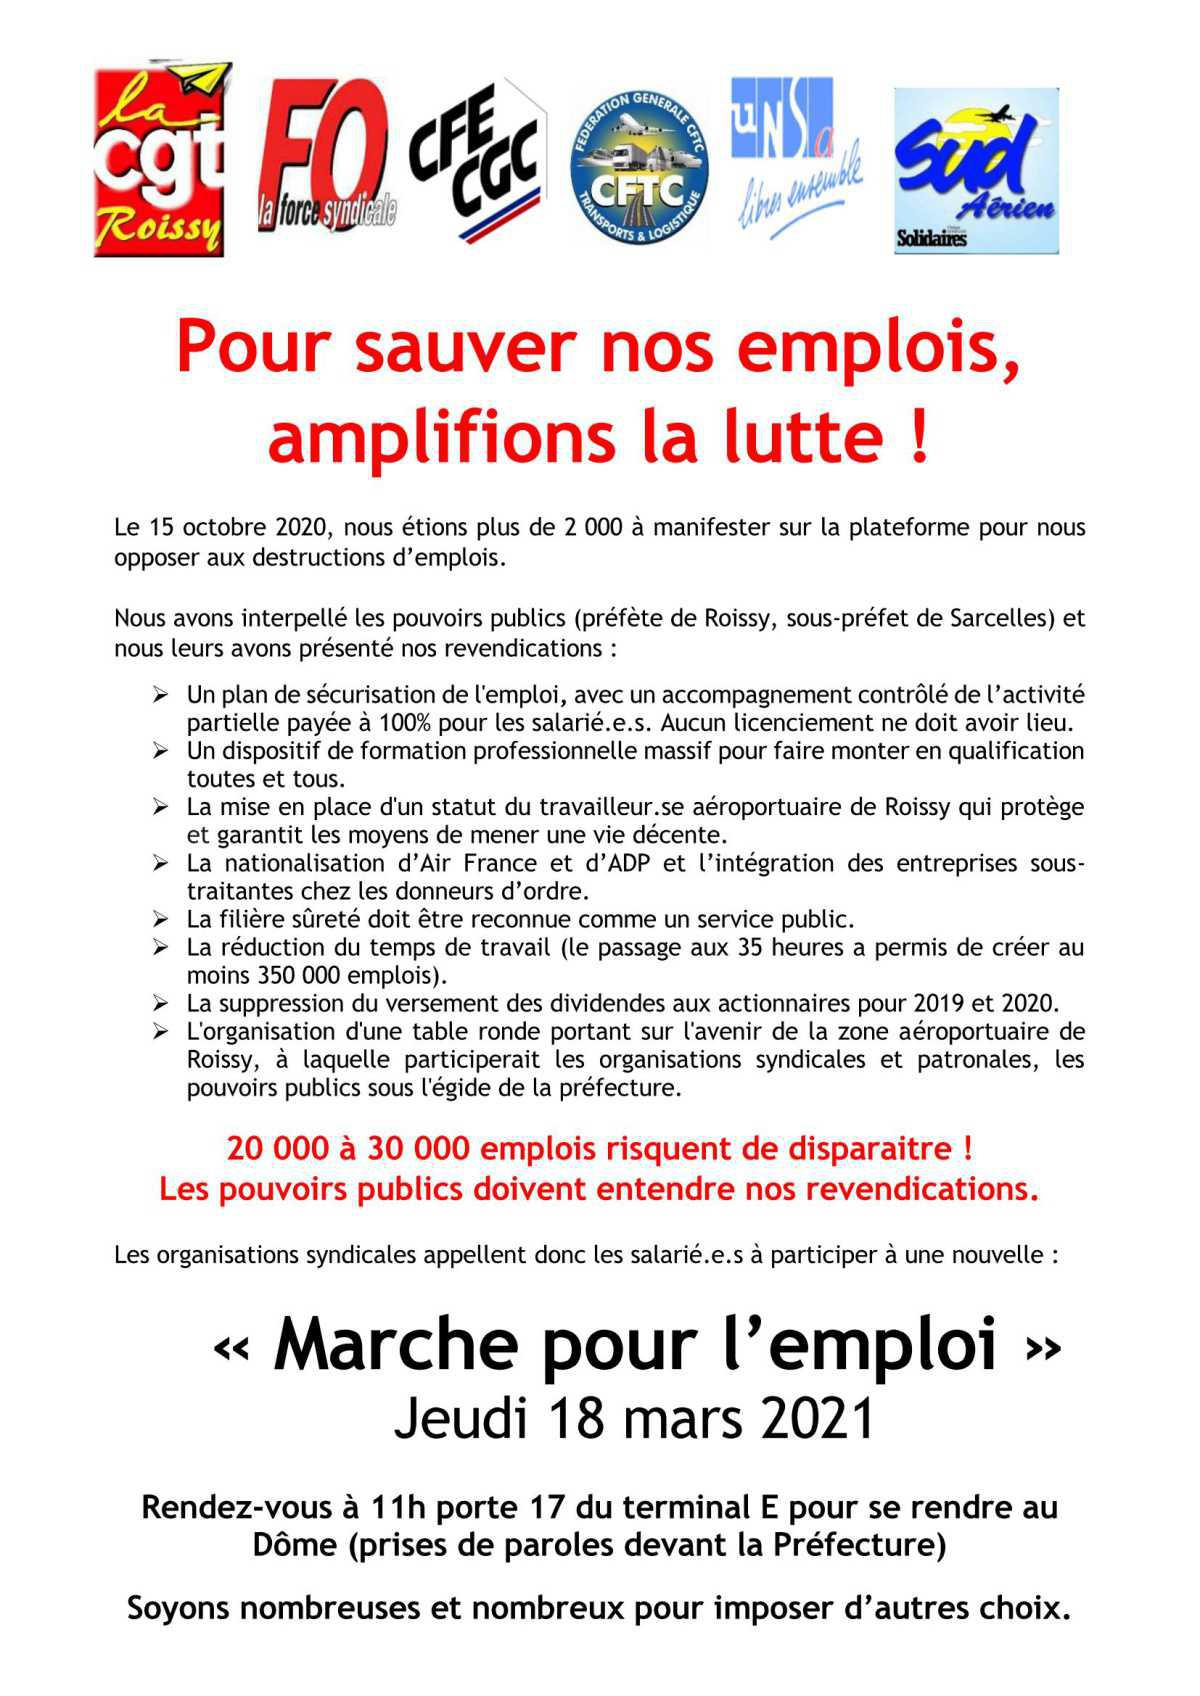 « Marche pour l'emploi » Jeudi 18 mars 2021.